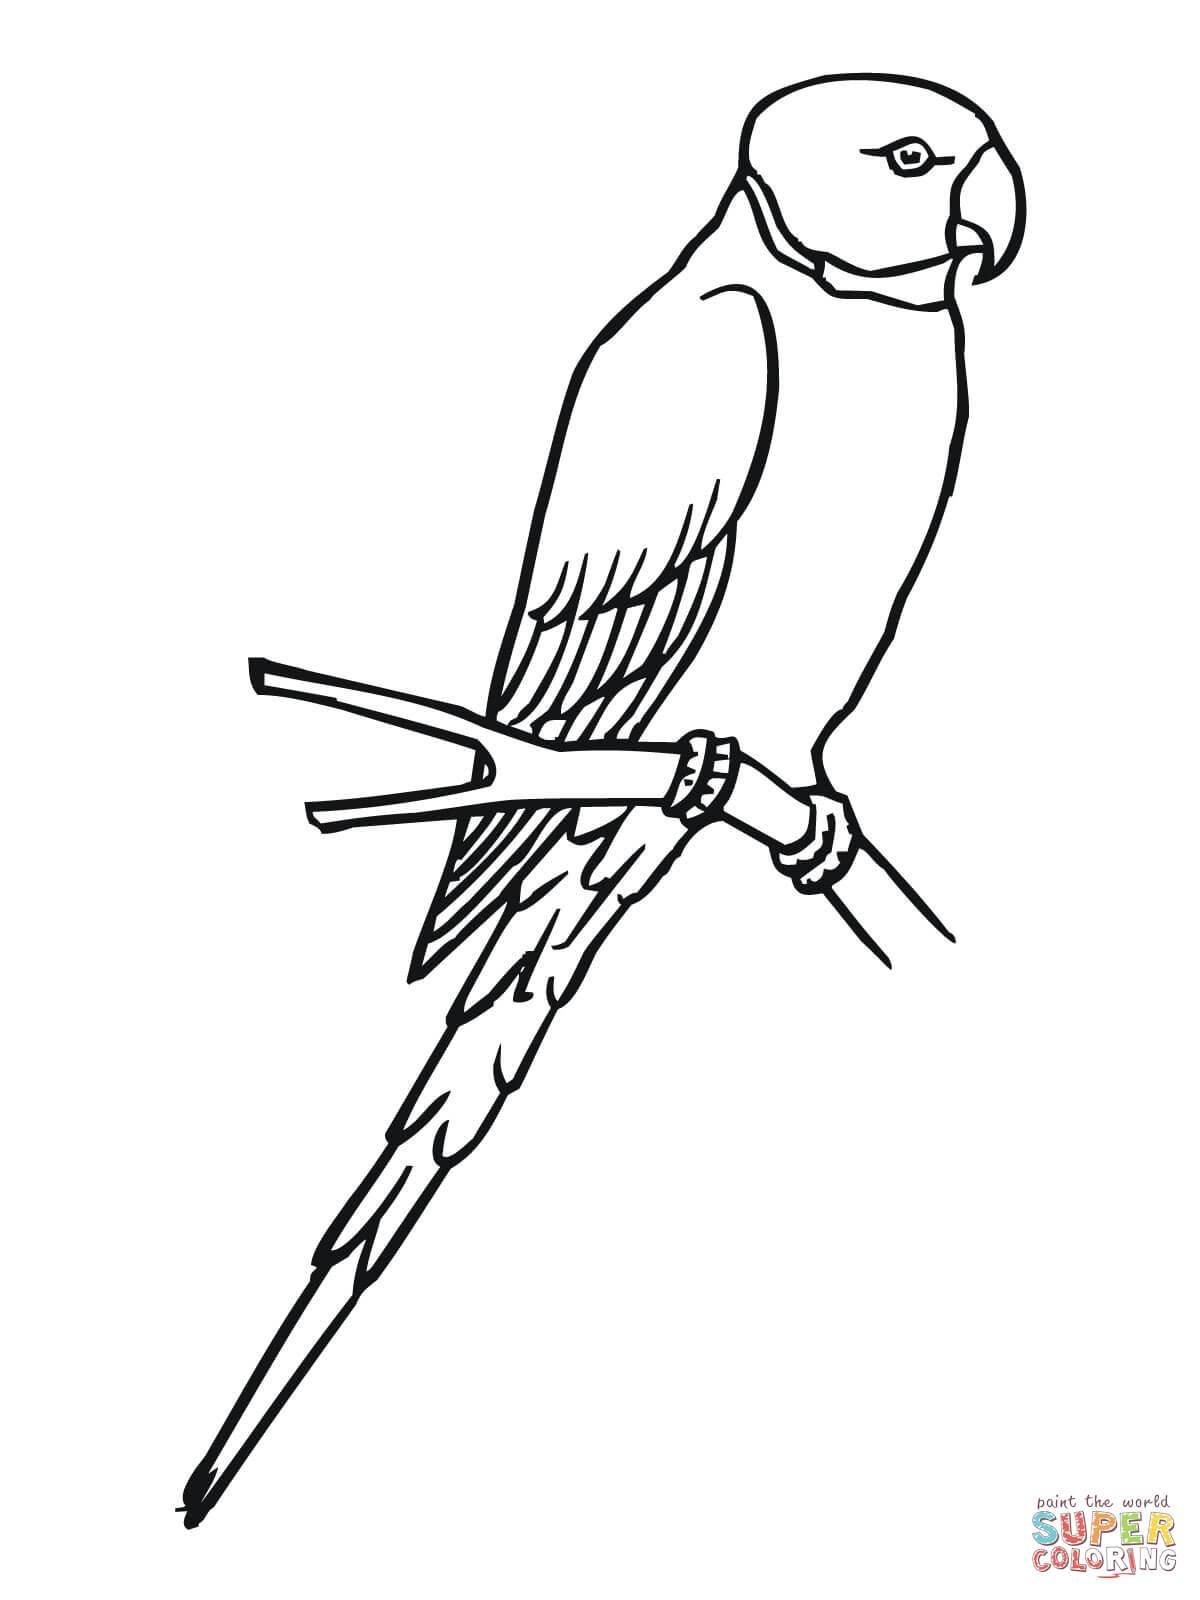 Dibujo de Un Periquito para colorear  Dibujos para